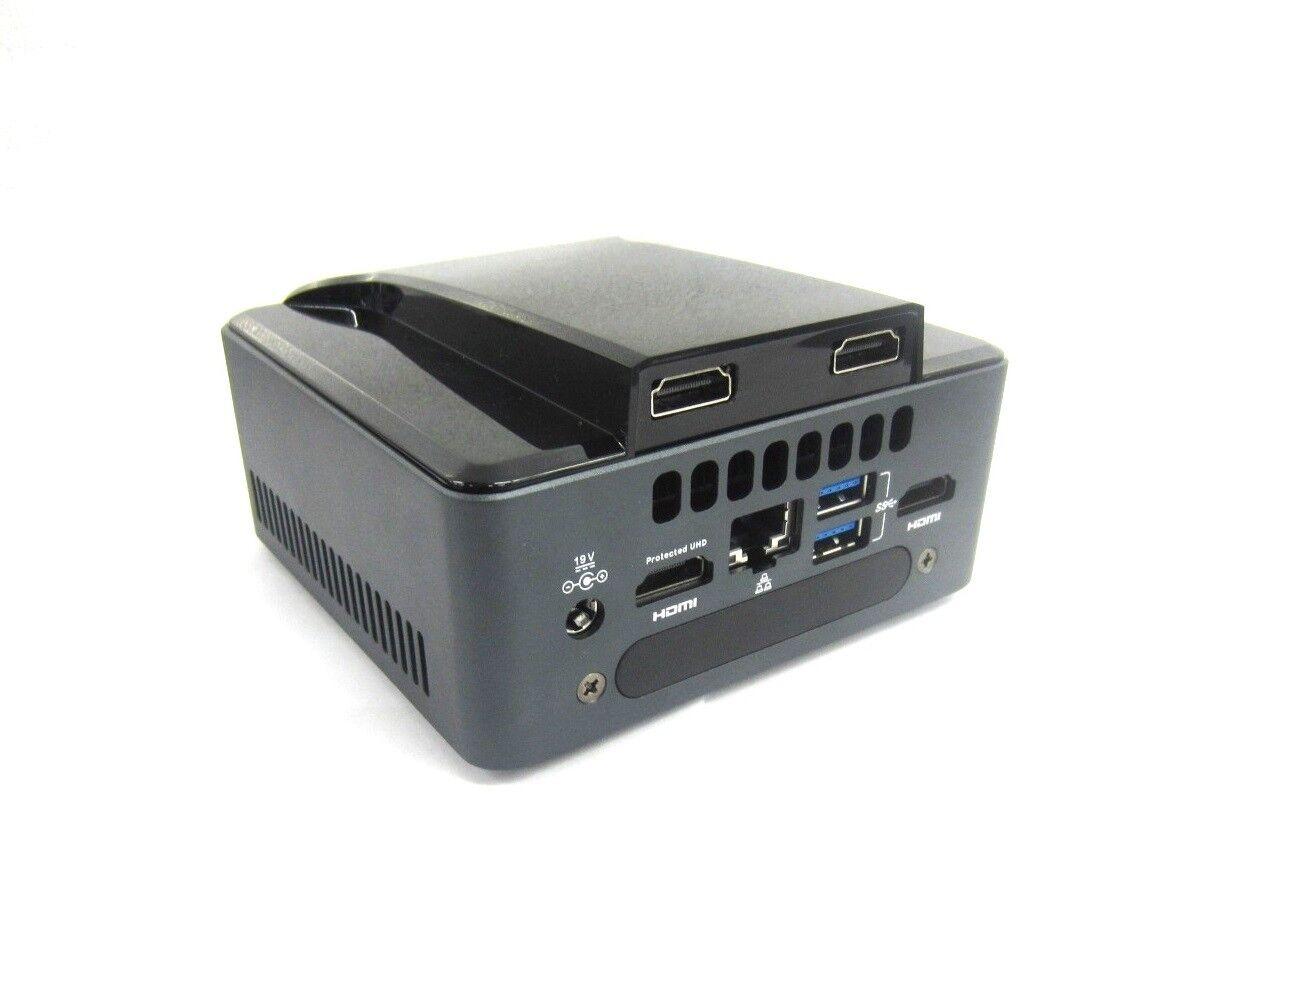 GORITE Intel NUC Single HDMI LID for 7th Generation Units